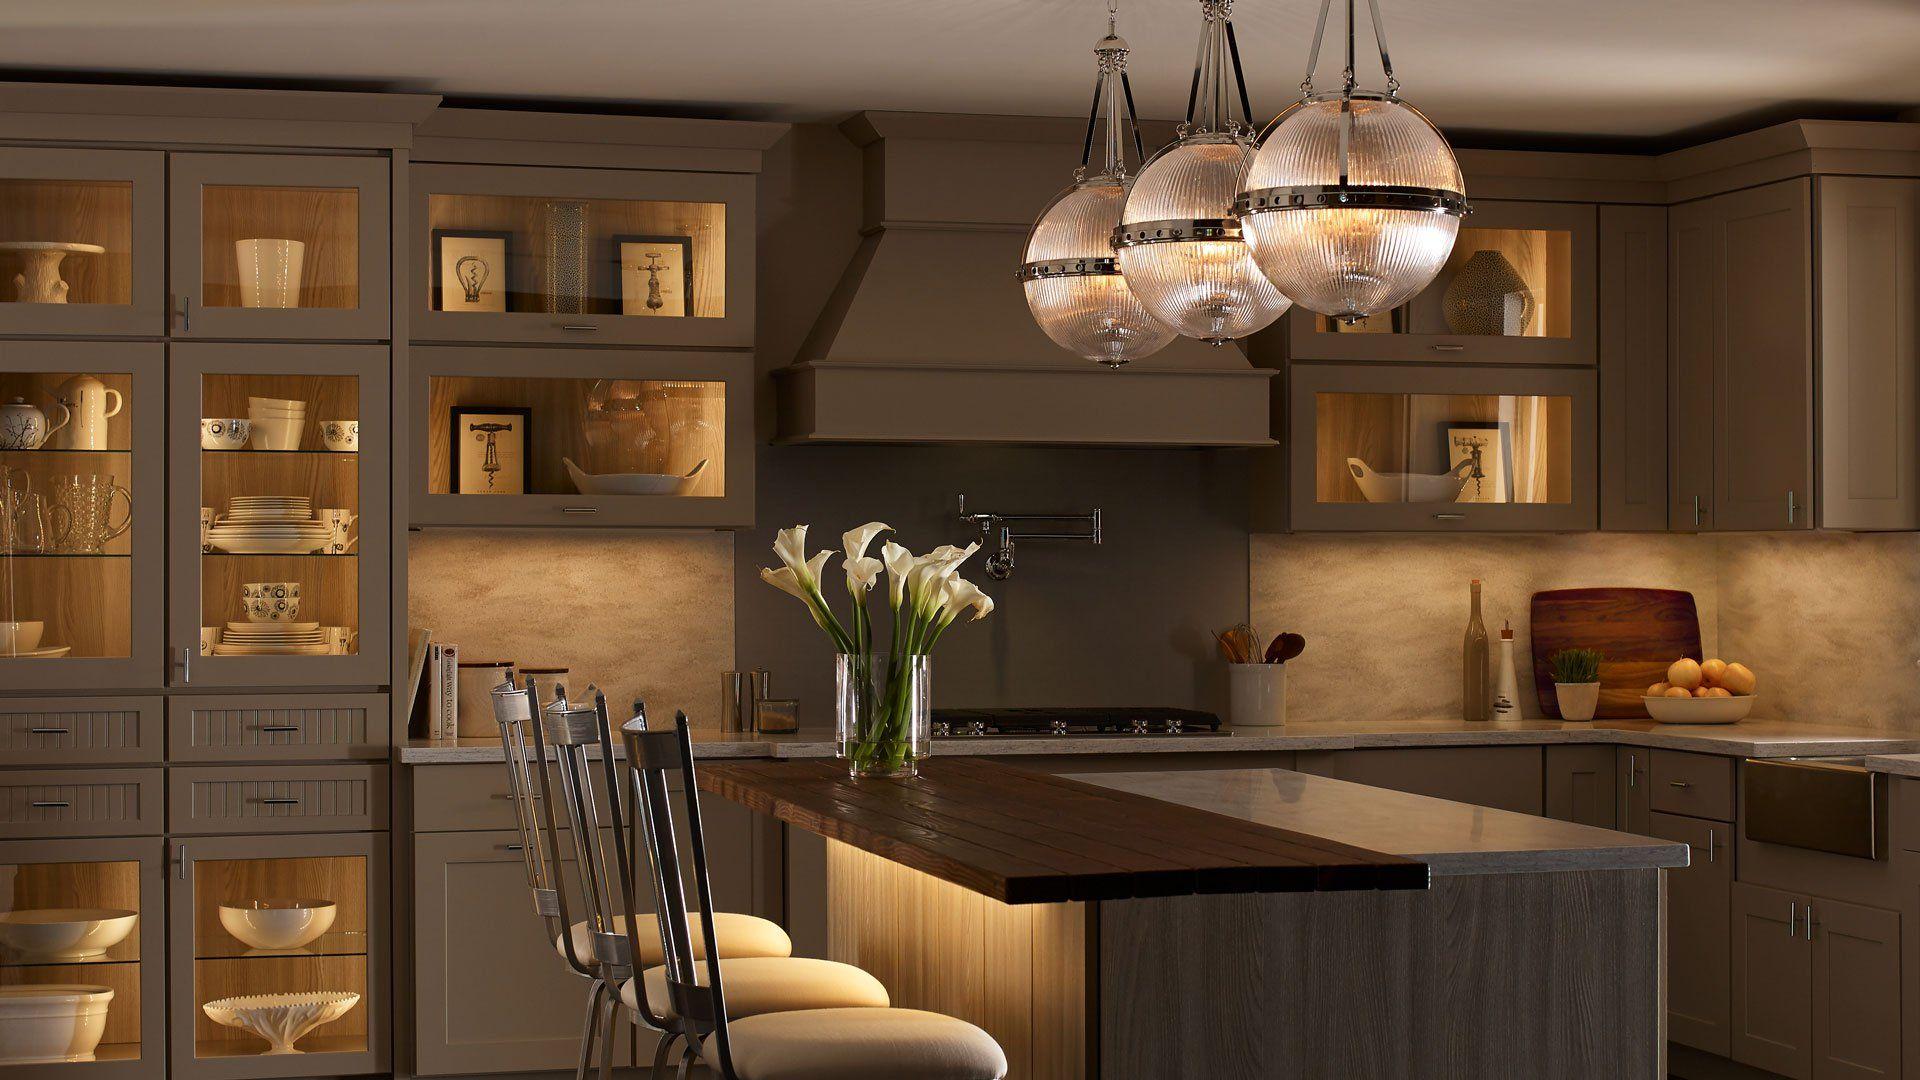 Gorgeous Inside Kitchen Cabinet Lighting Kitchen Under Cabinet Lighting Inside Kitchen Cabinets Light Kitchen Cabinets